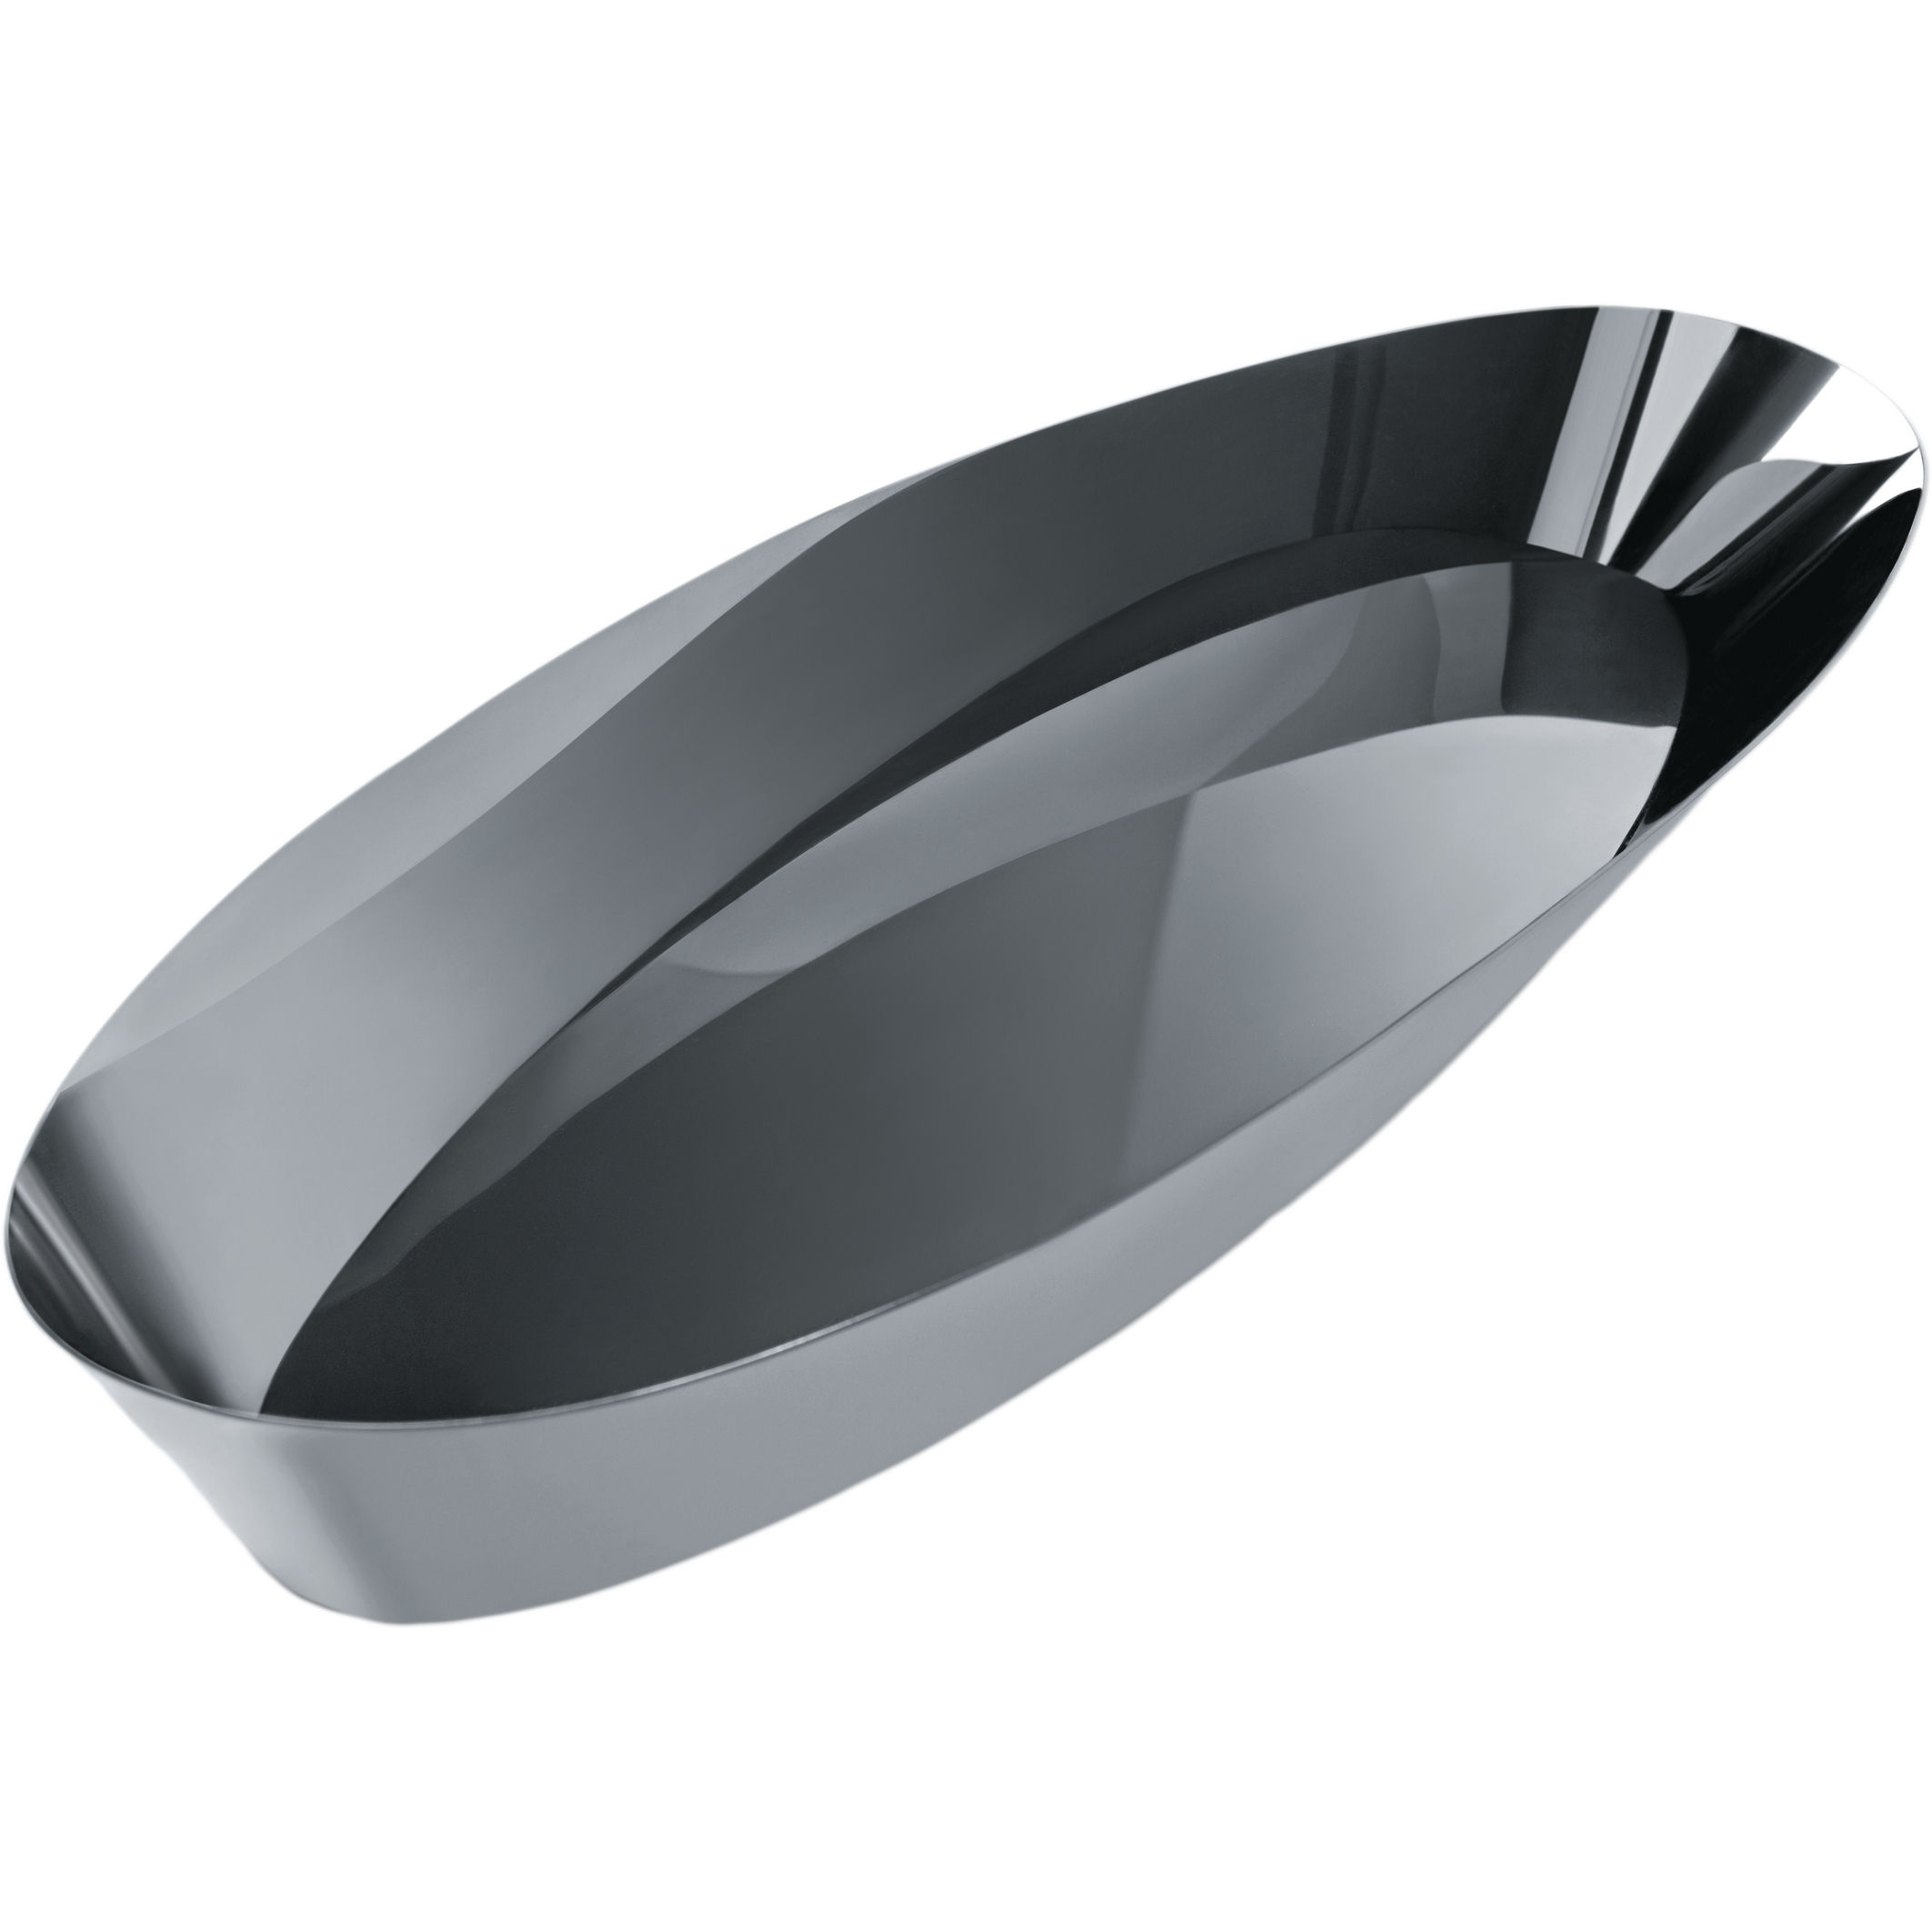 corbeille pain pinpin 37 x 15 cm acier brillant alessi made in design. Black Bedroom Furniture Sets. Home Design Ideas